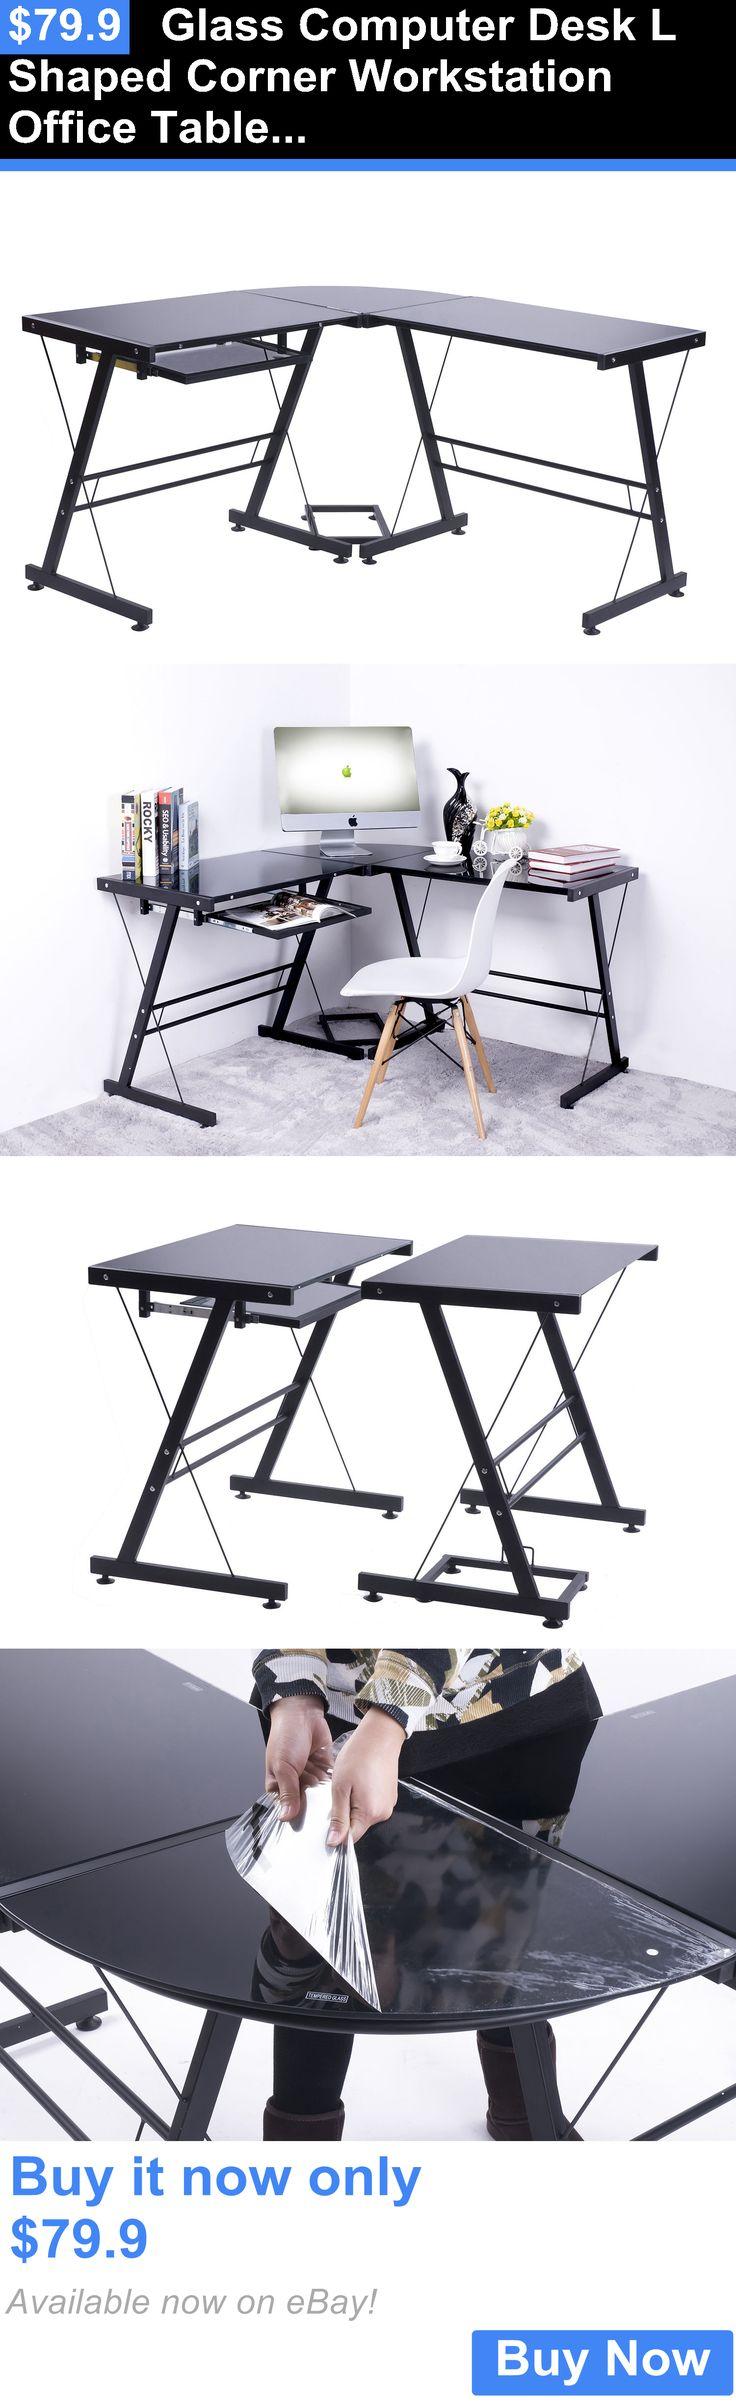 Office Furniture: Glass Computer Desk L Shaped Corner Workstation Office Table Furniture Black BUY IT NOW ONLY: $79.9